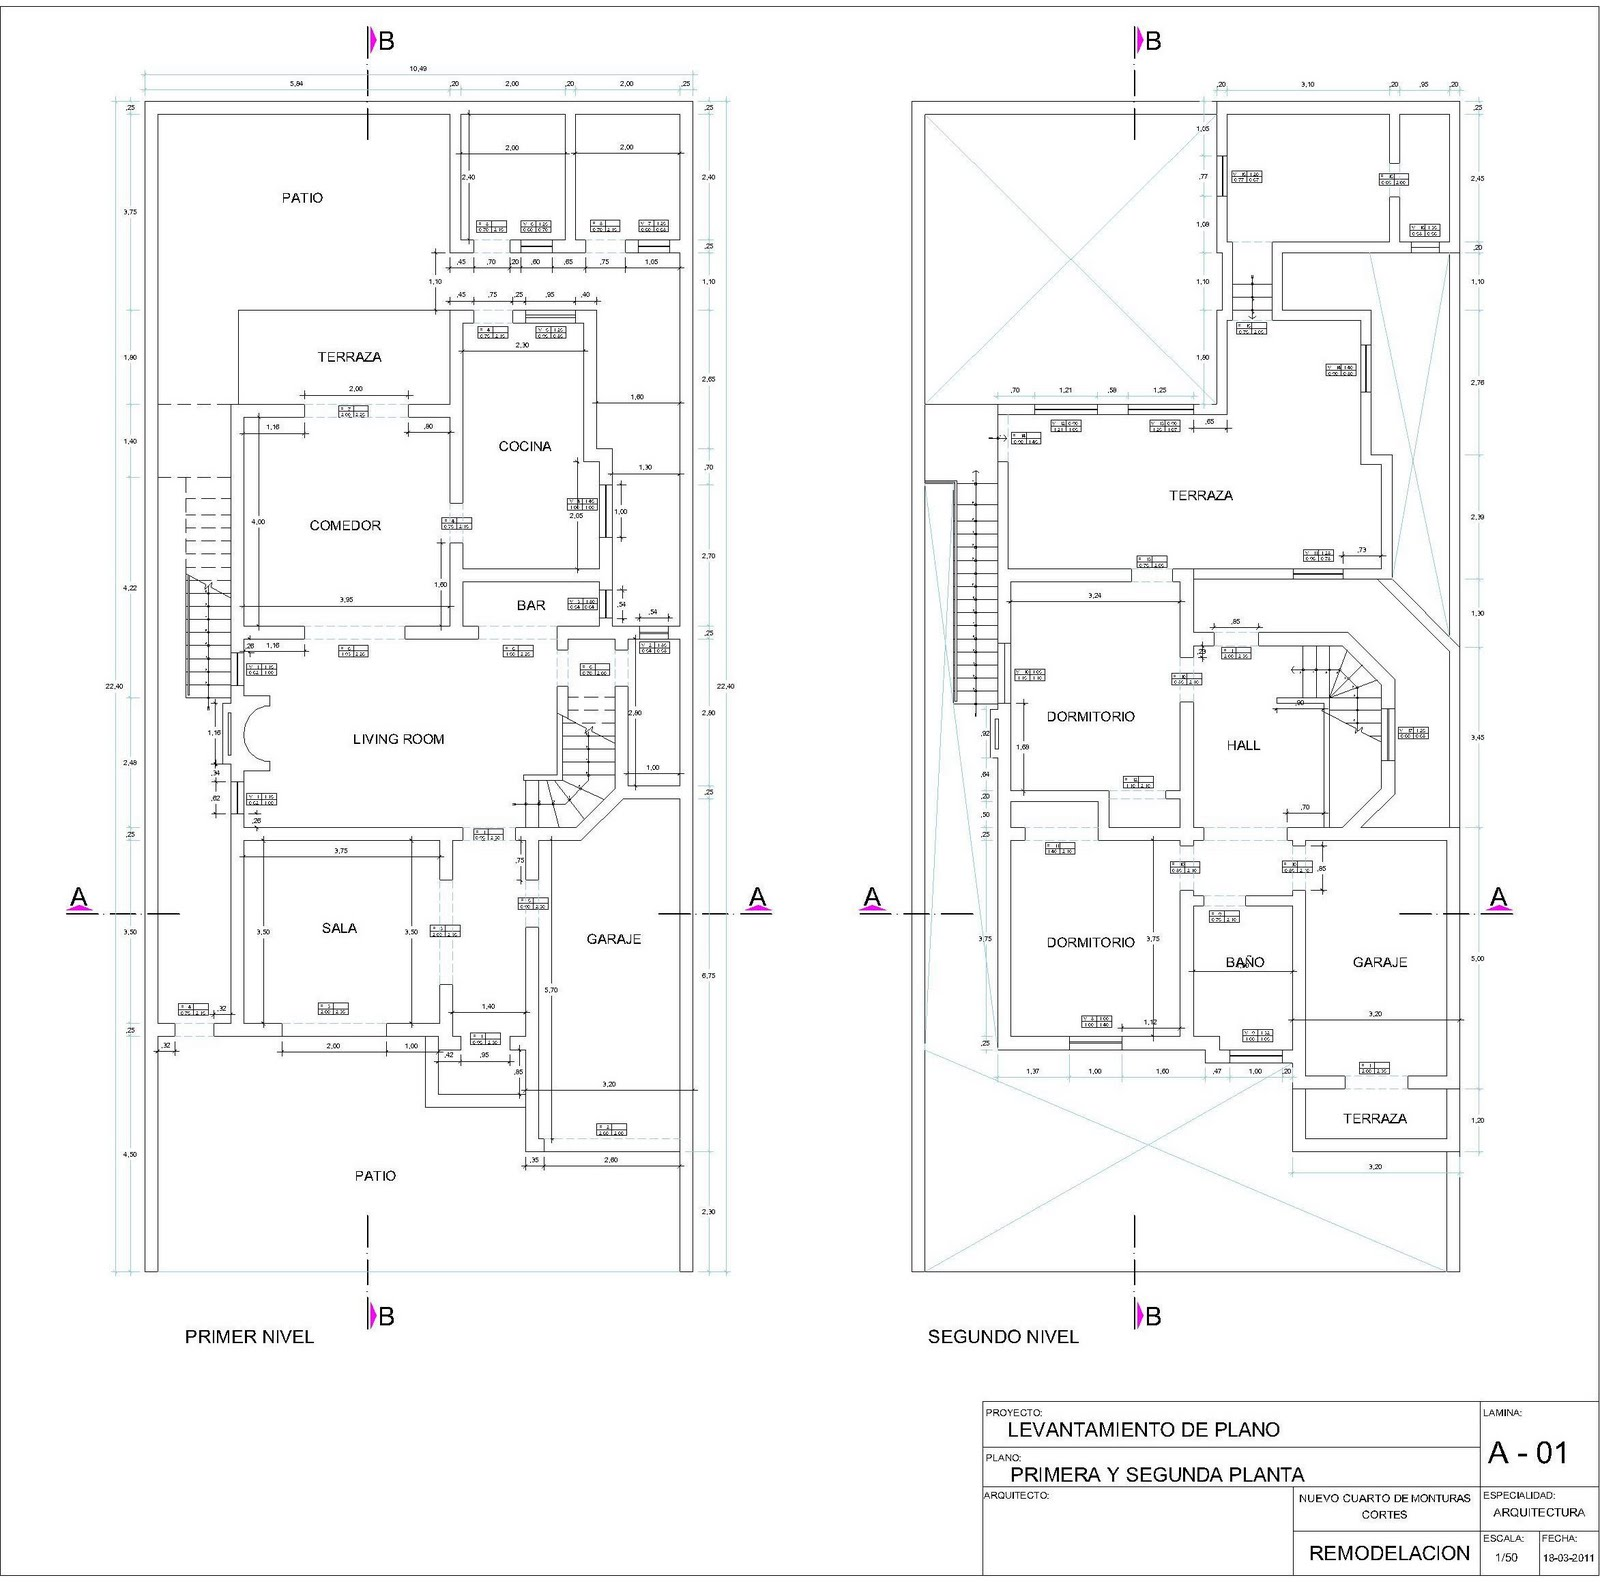 Arqsihuis remodelacion for Planos de arquitectura